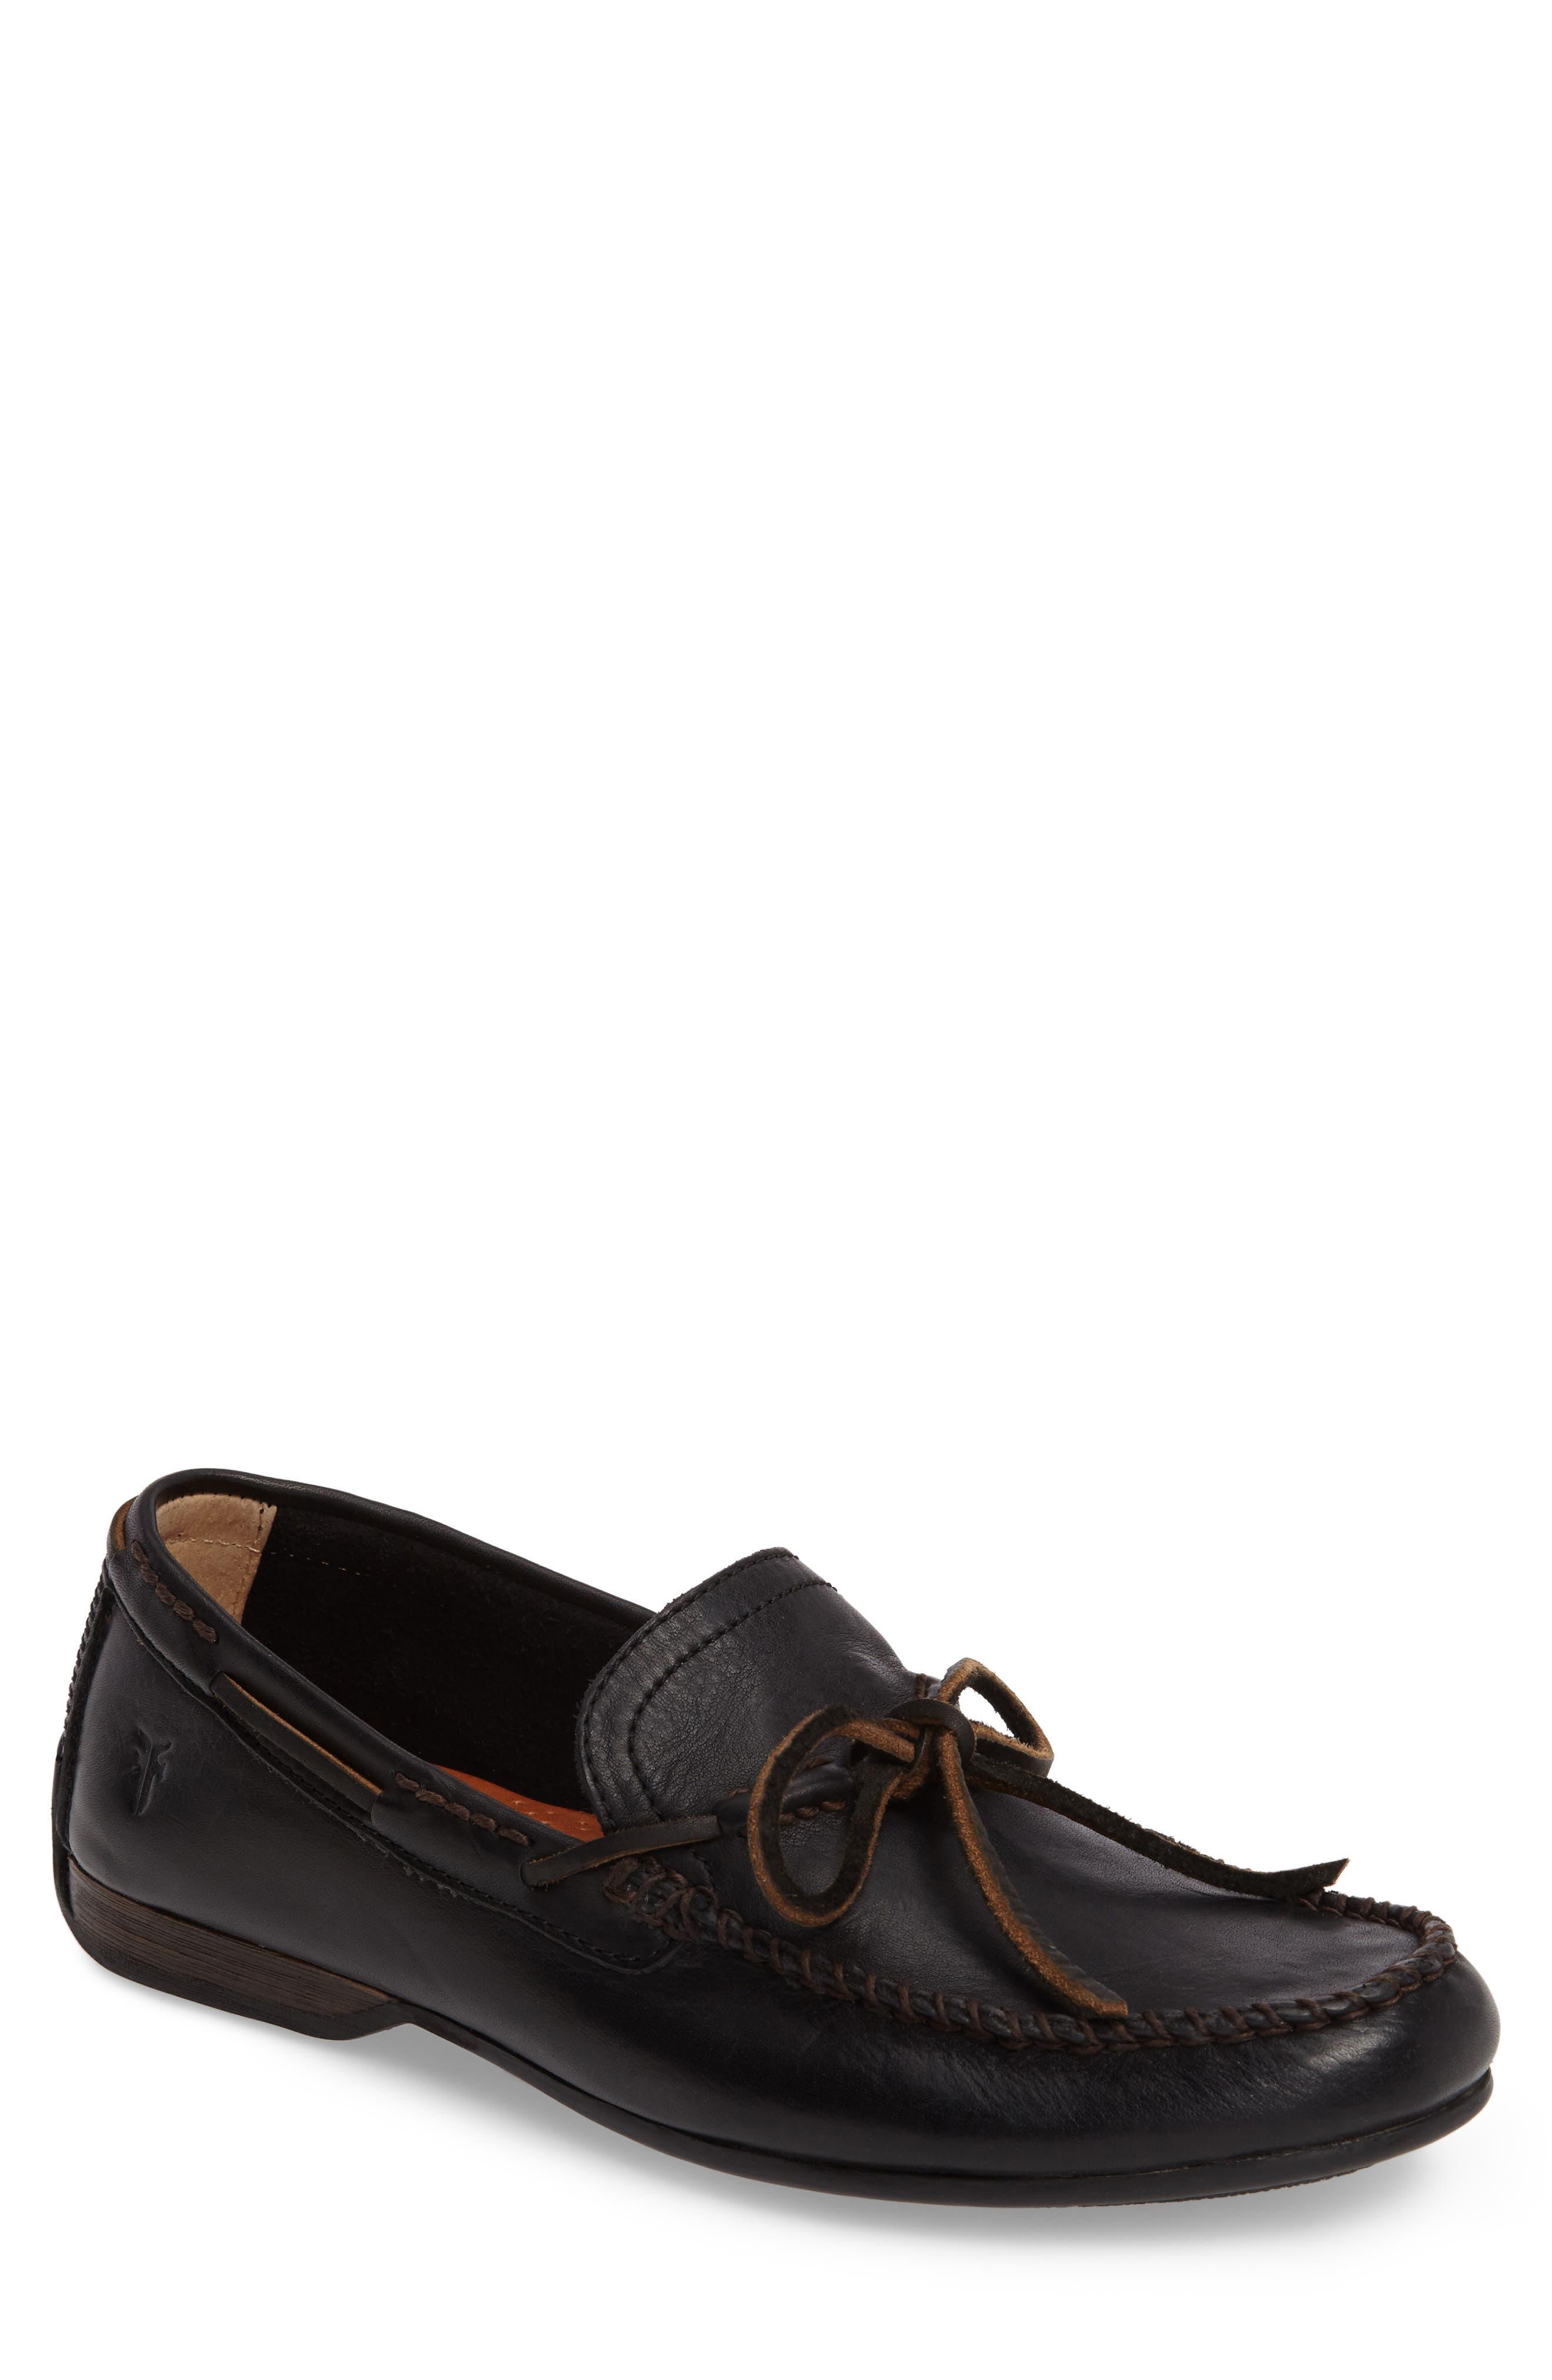 'Lewis' Loafer,                         Main,                         color, 001